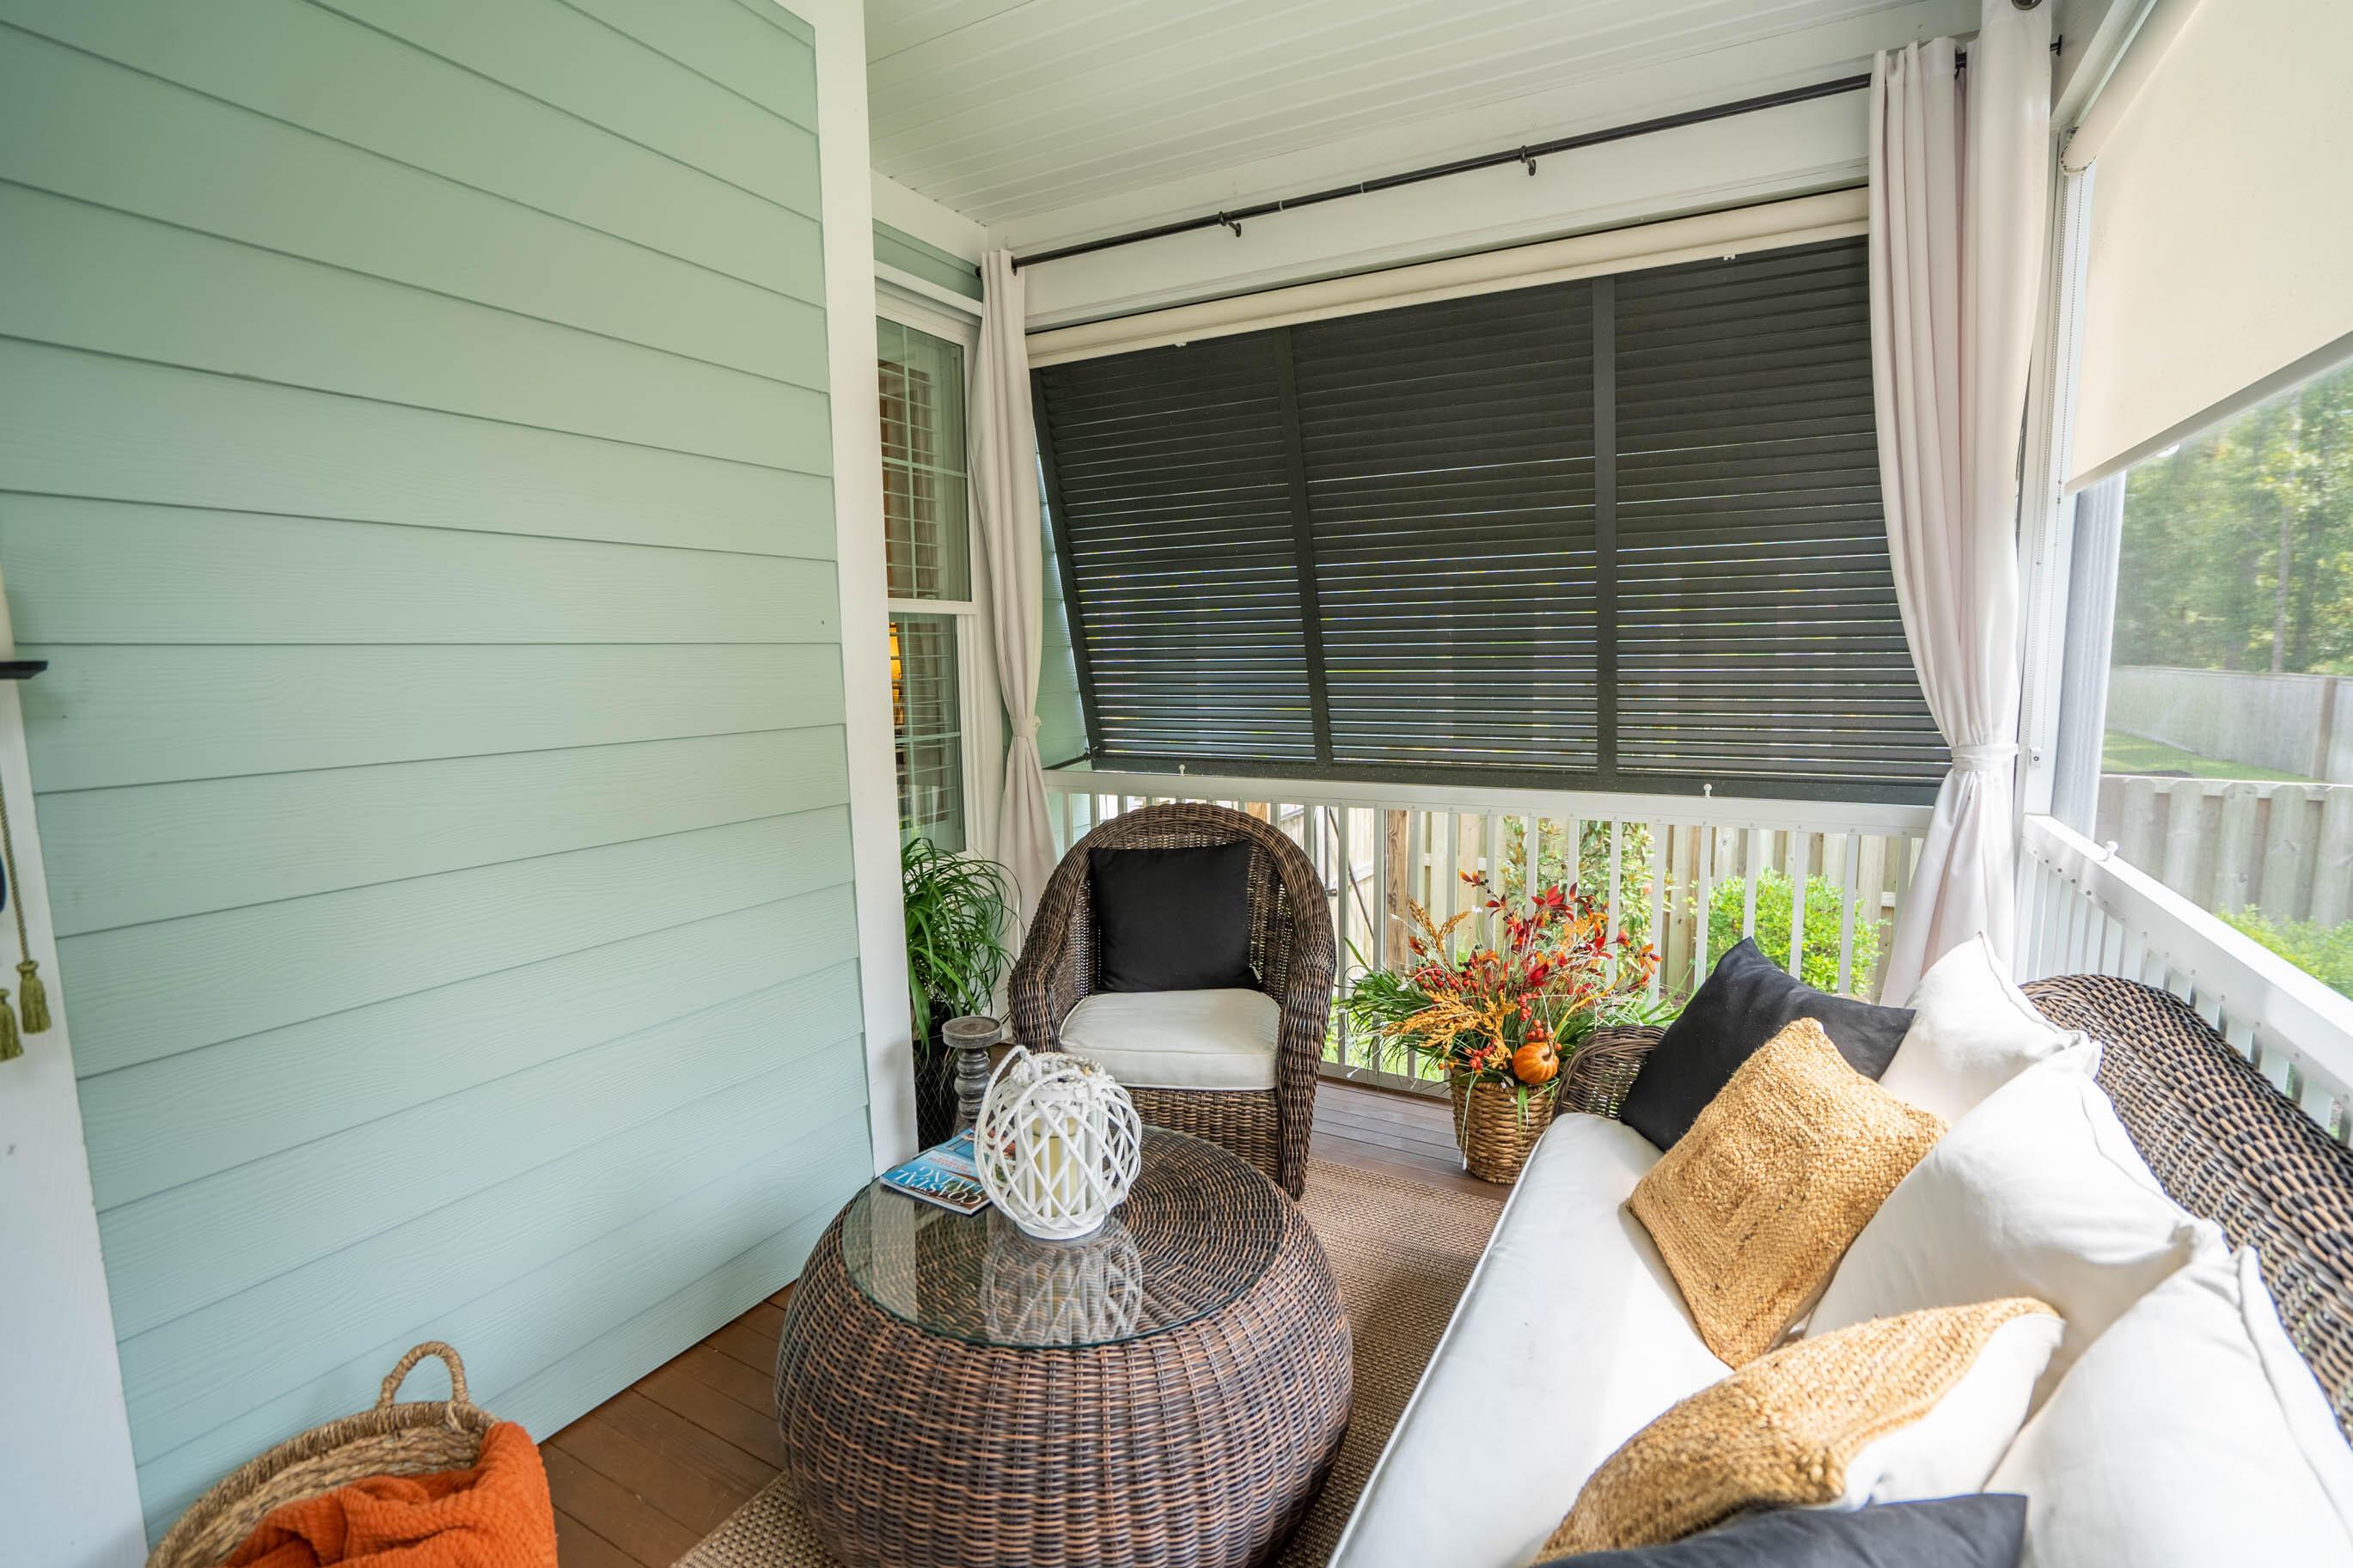 Park West Homes For Sale - 1479 Brightwood, Mount Pleasant, SC - 23